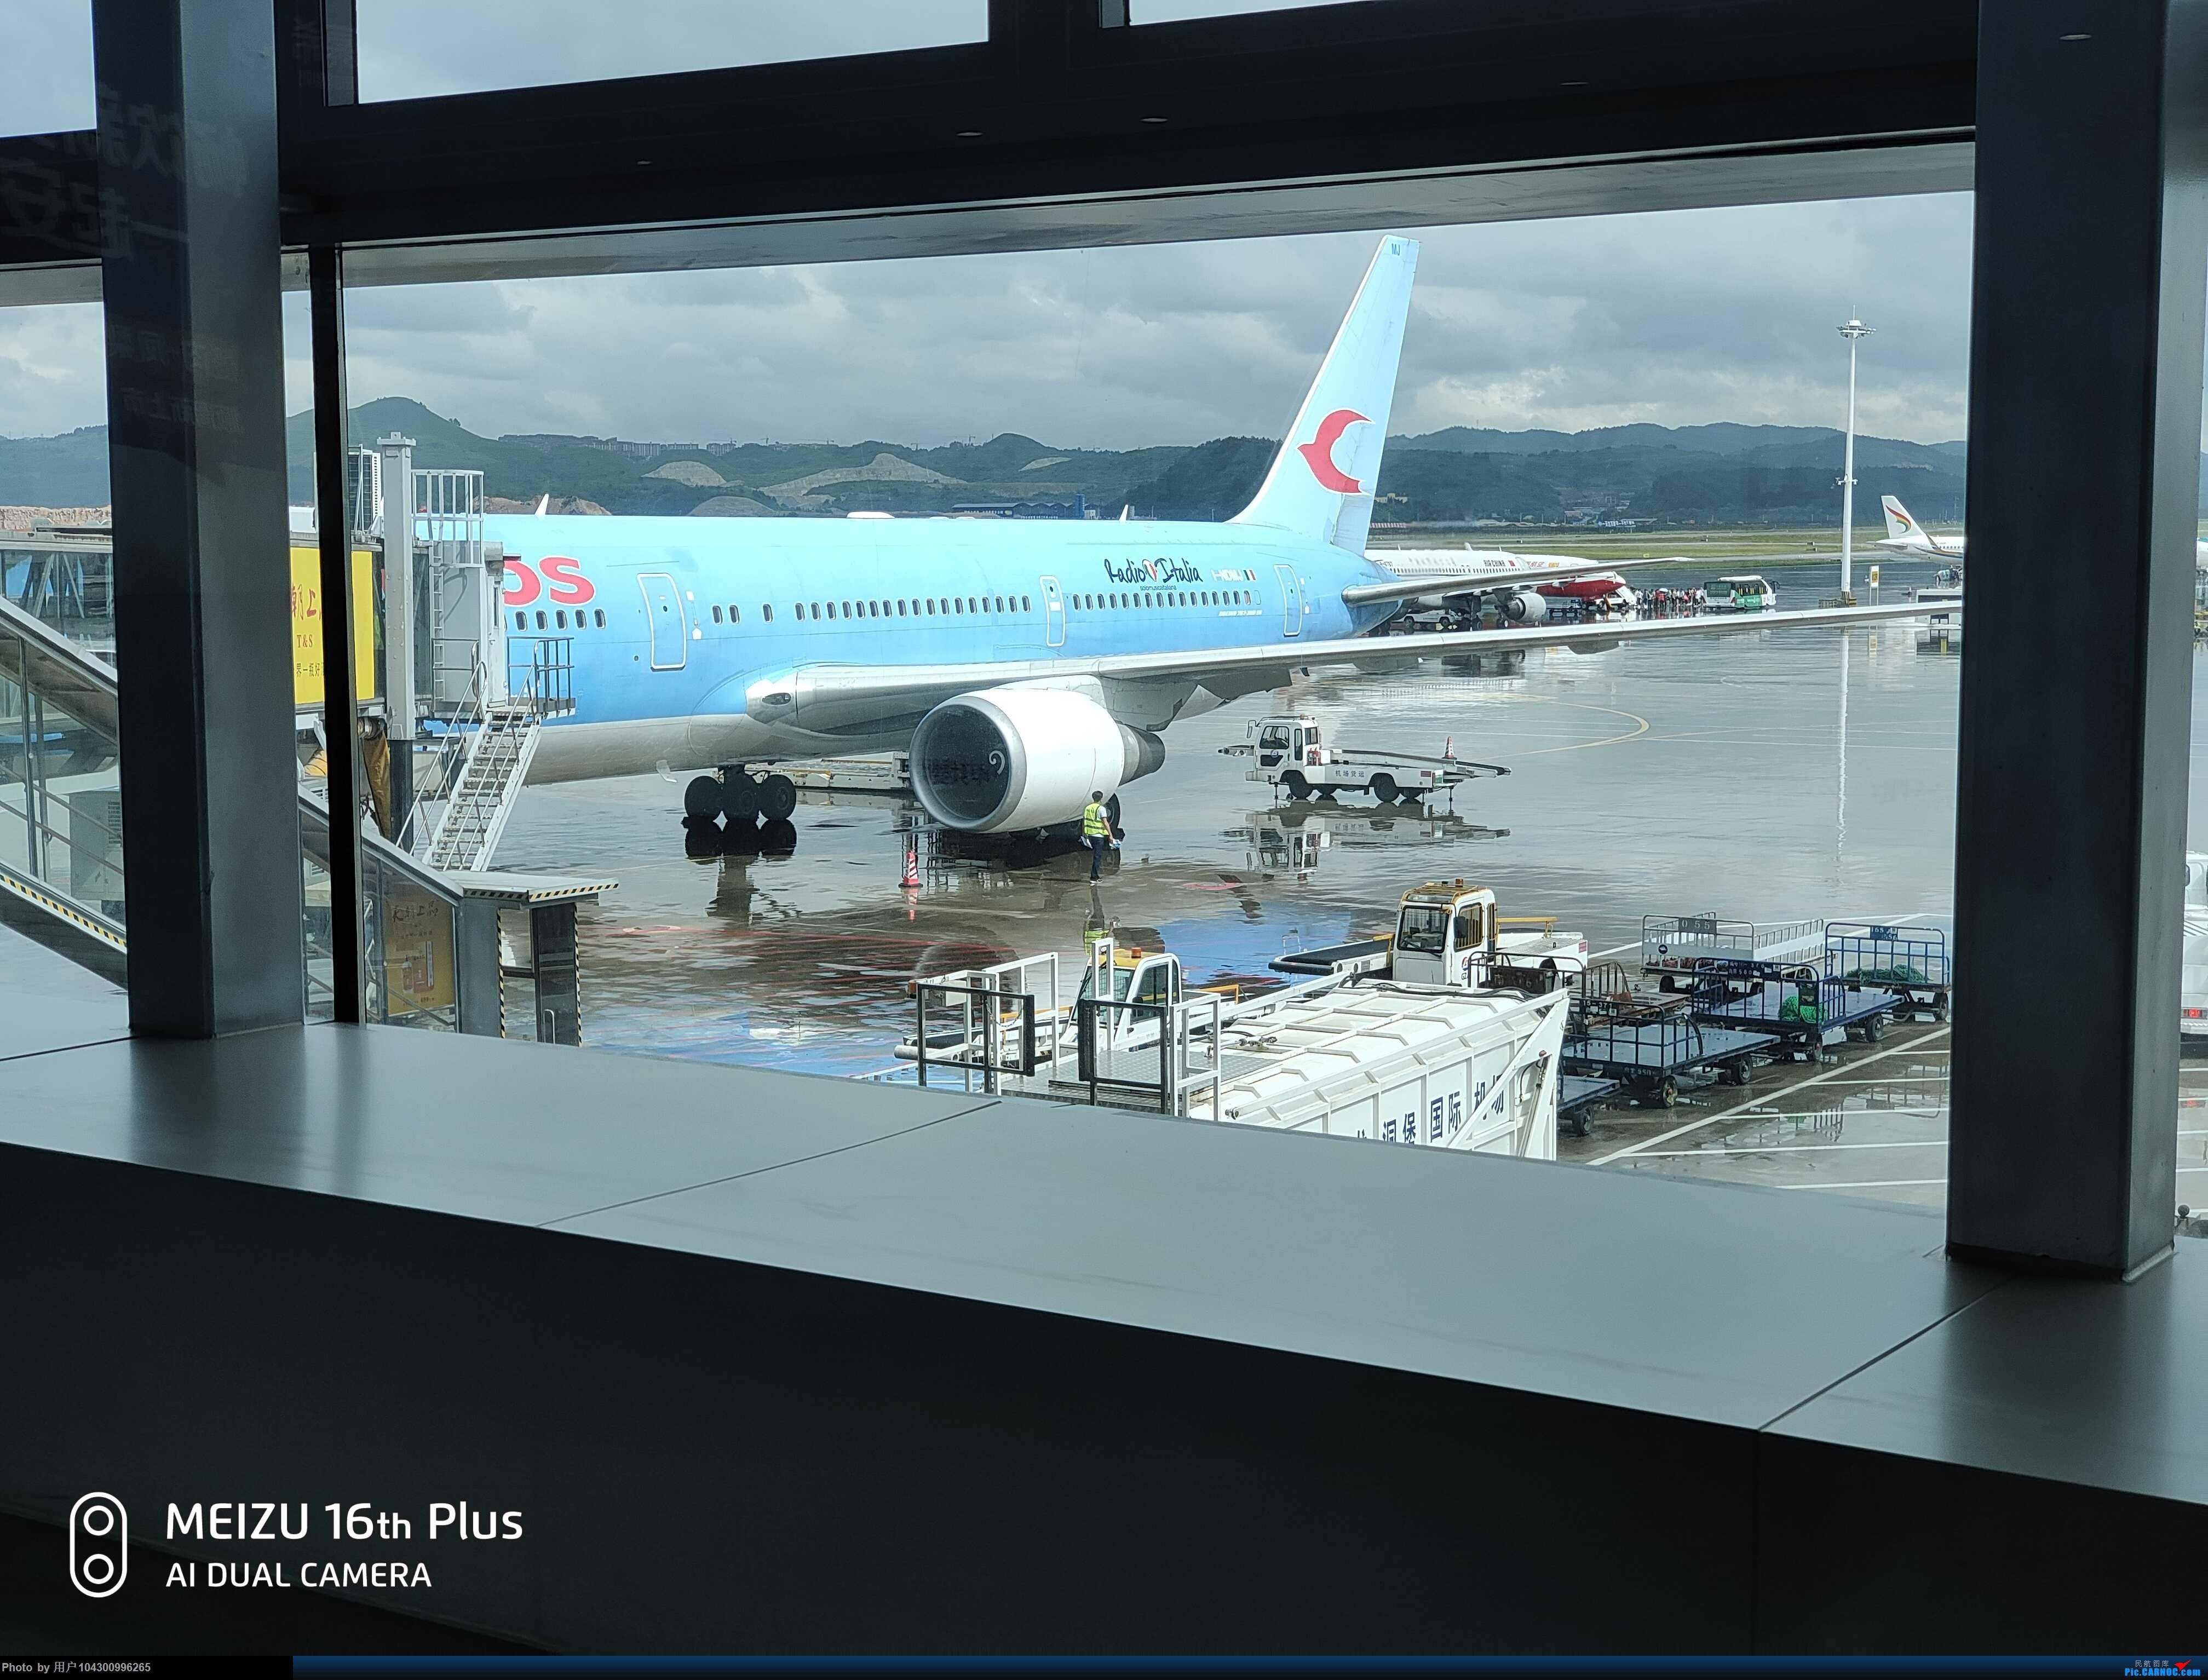 Re:[原创][DM哥飞行游记]-多彩贵州航空贵阳-茅台当日往返 BOEING 767-300ER INDMJ 中国贵阳龙洞堡国际机场